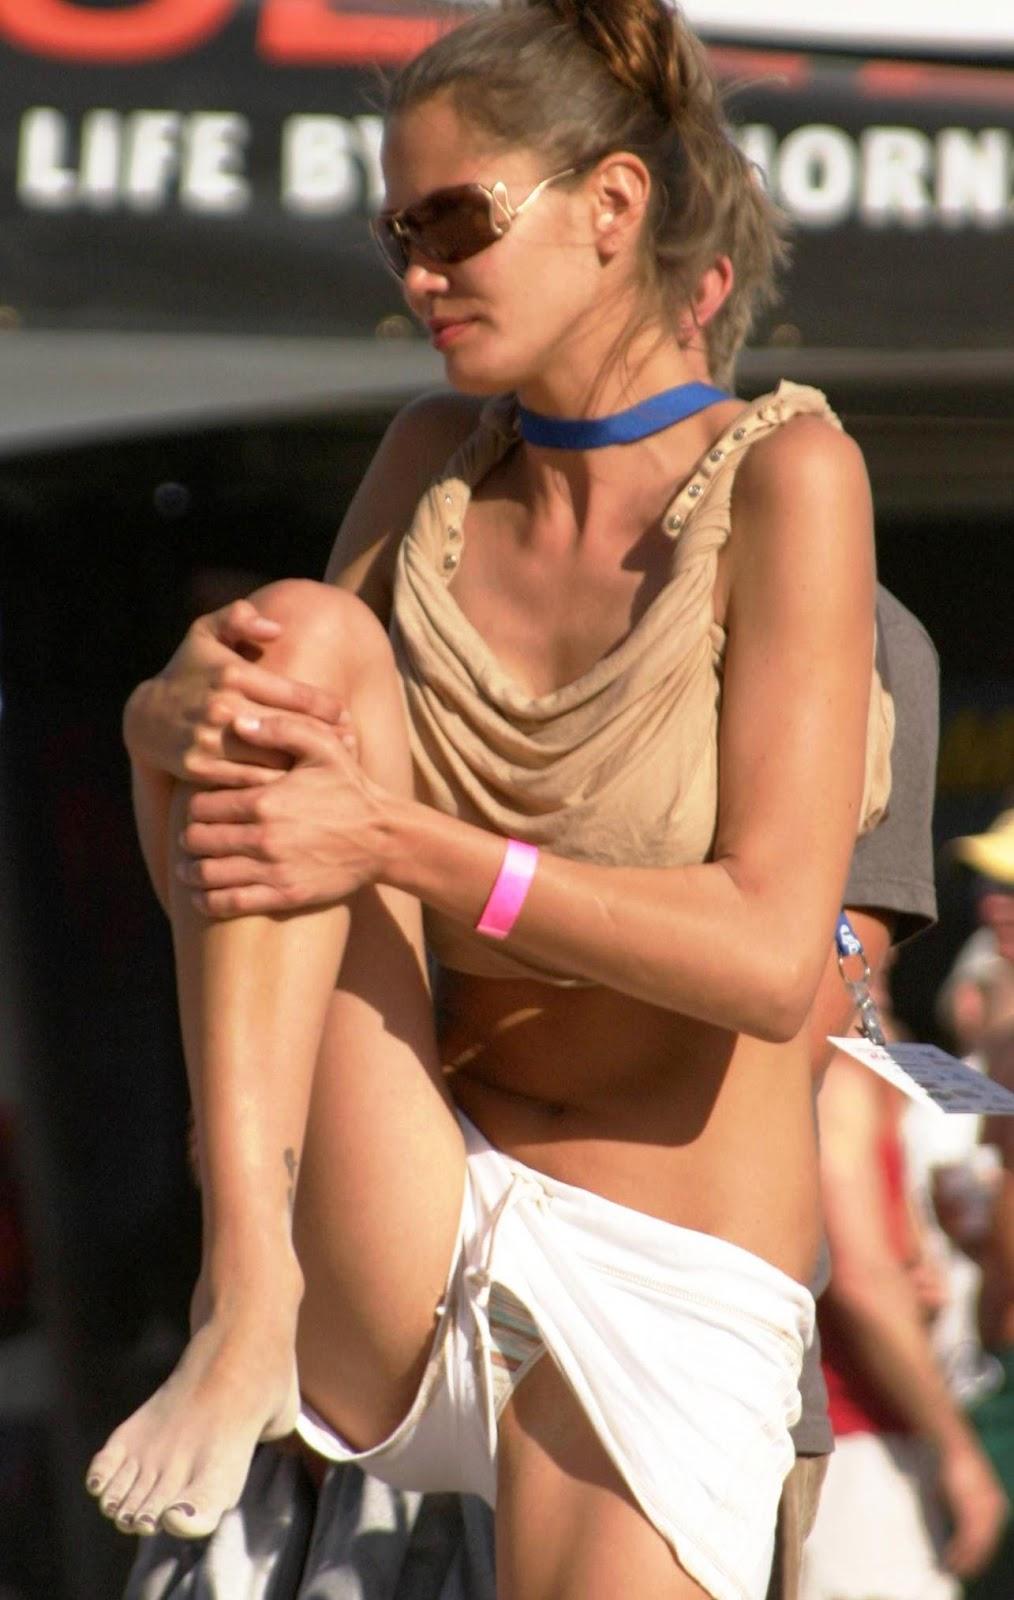 Bangaladesh sexey nude girl com